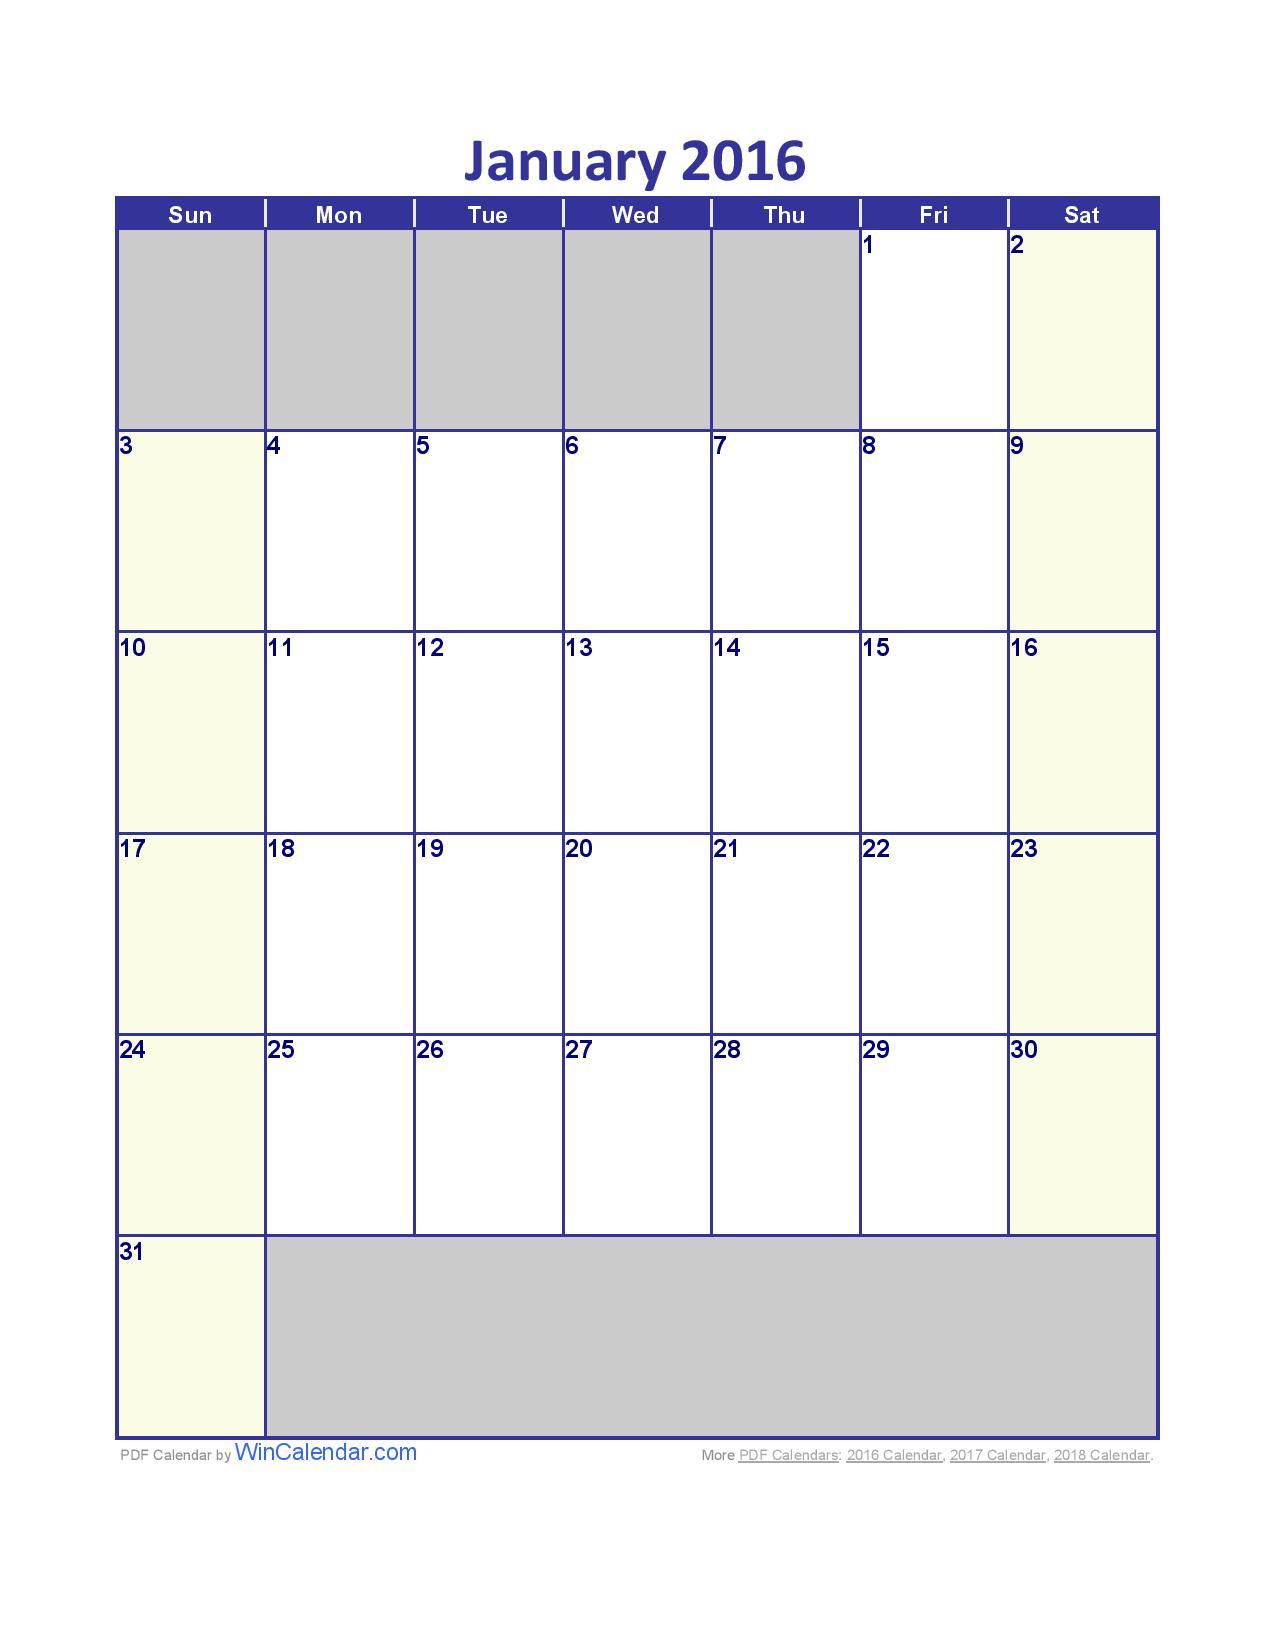 january-2016-calendar.jpg